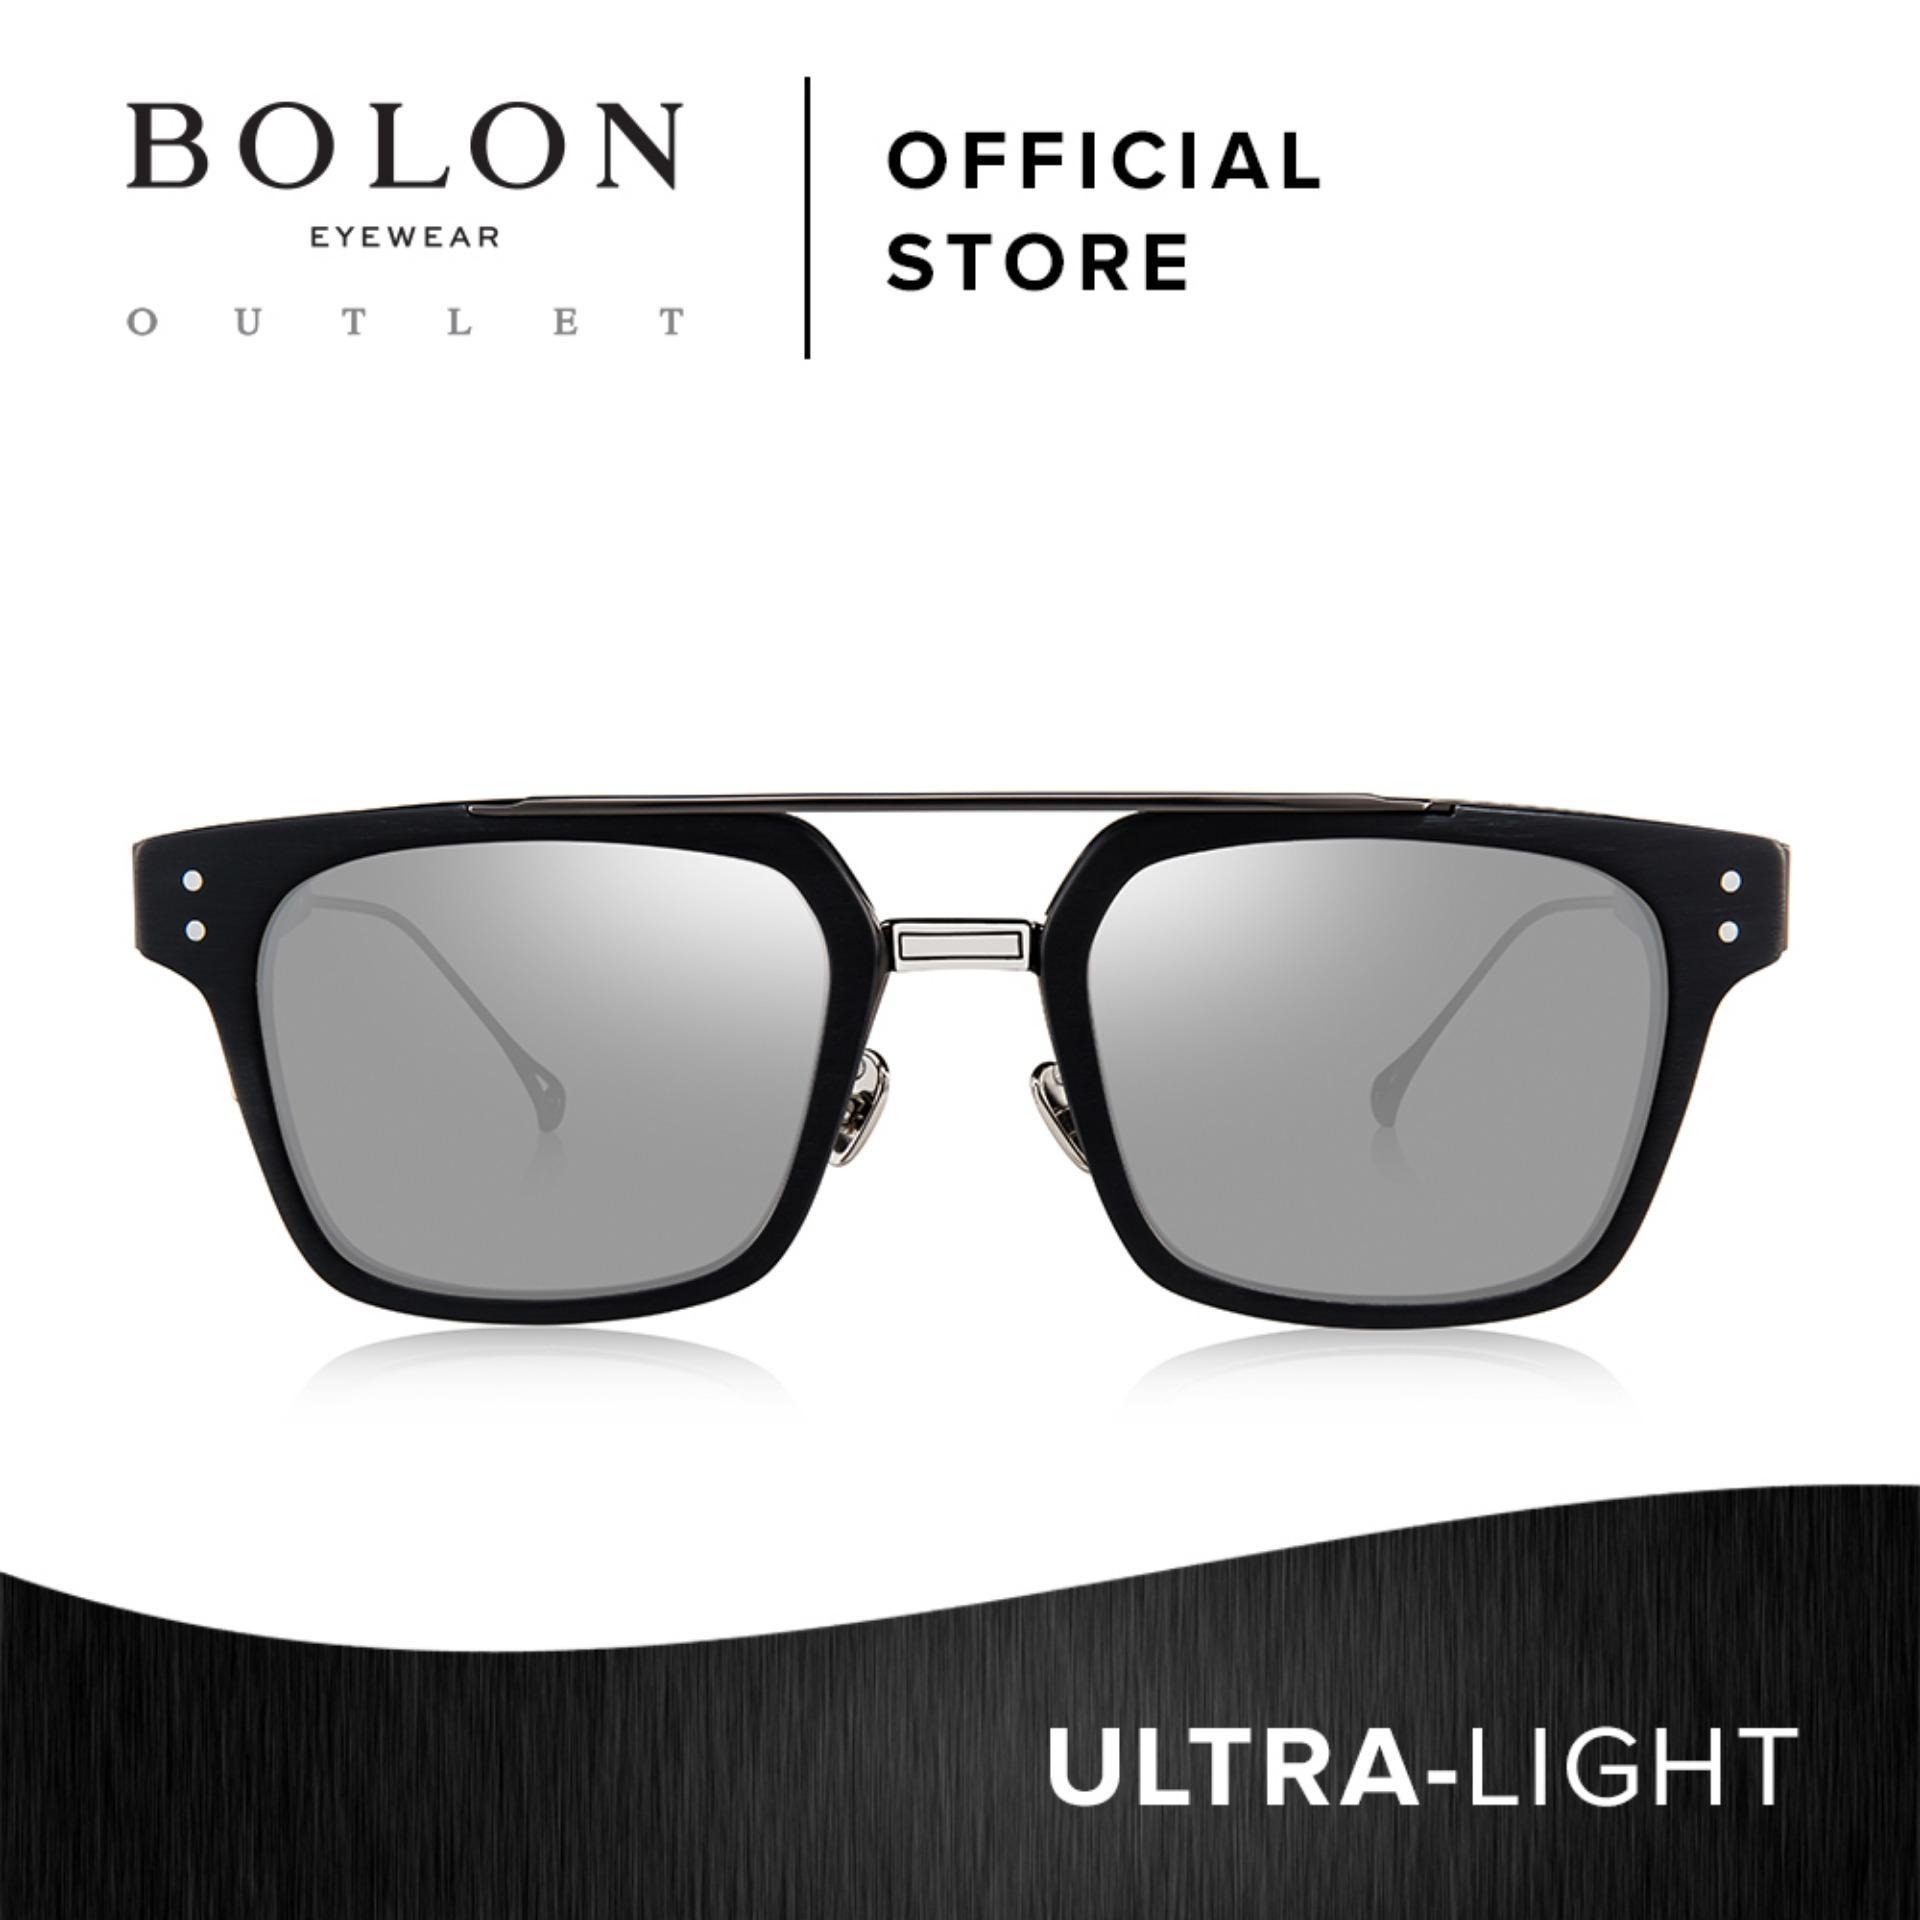 6cdc97a46ad BOLON Eyewear Unisex Square Sunglasses Skyler BV6000 Black